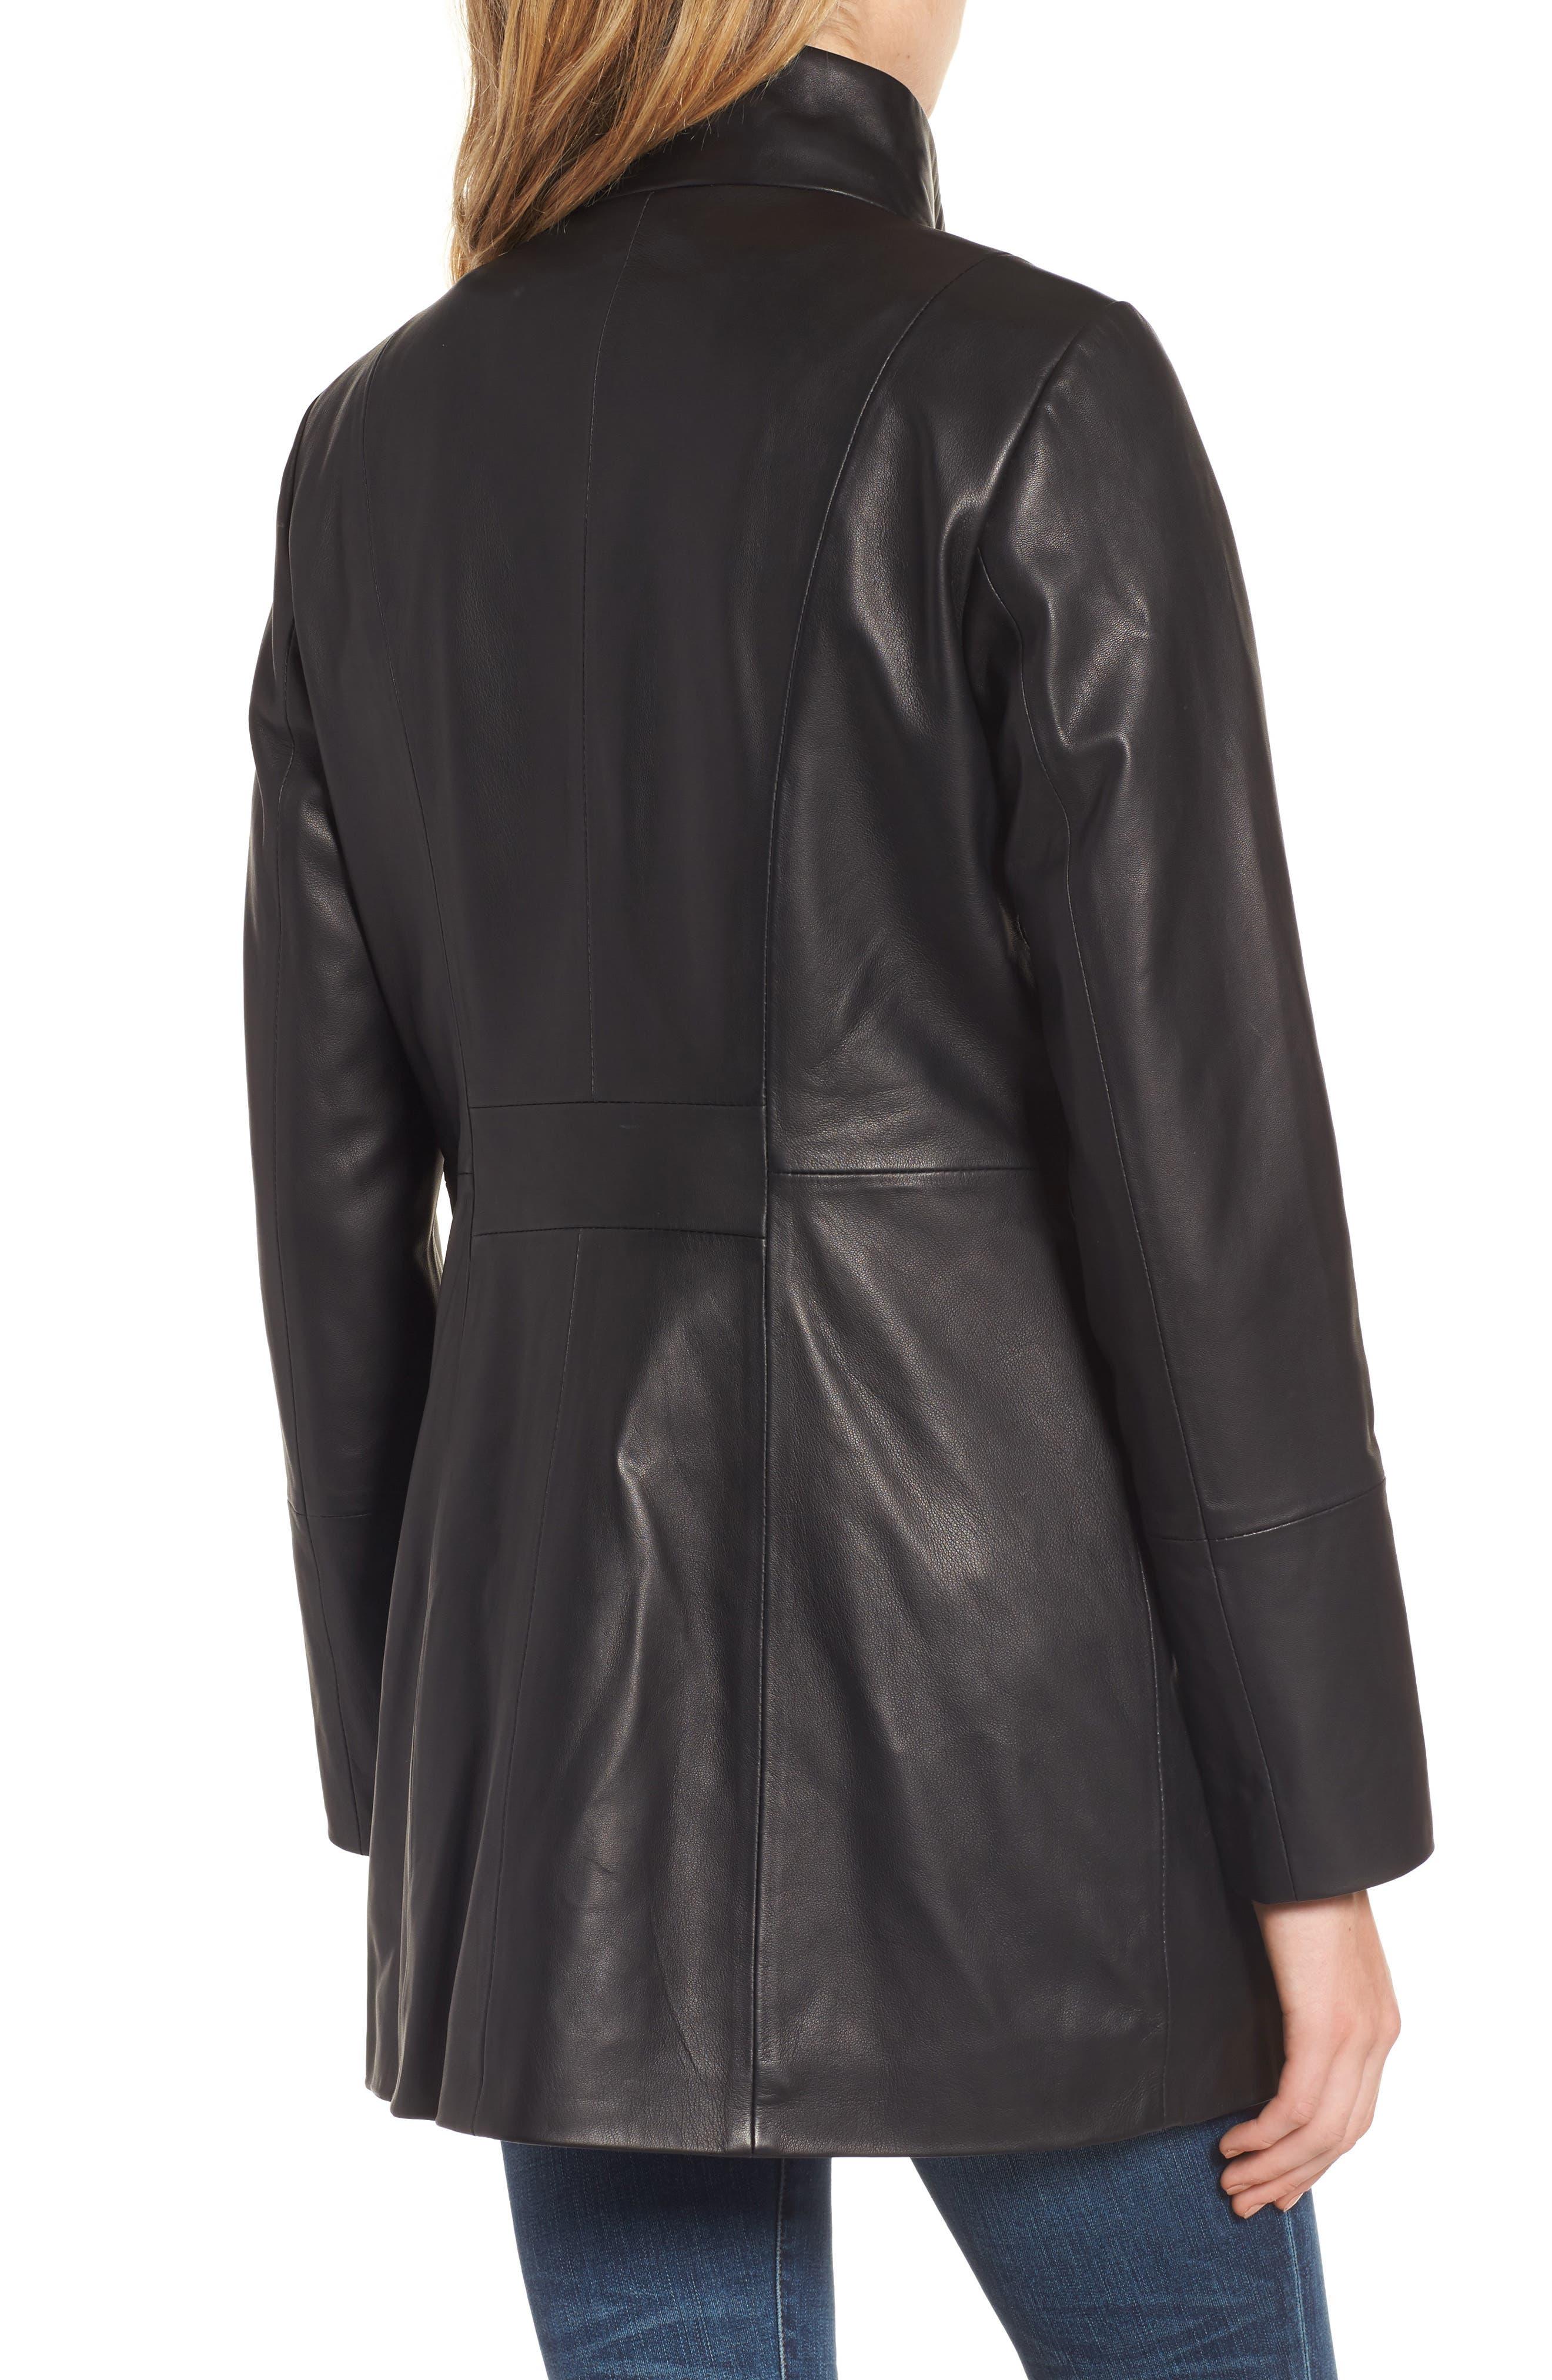 Leather Car Coat,                             Alternate thumbnail 2, color,                             Black